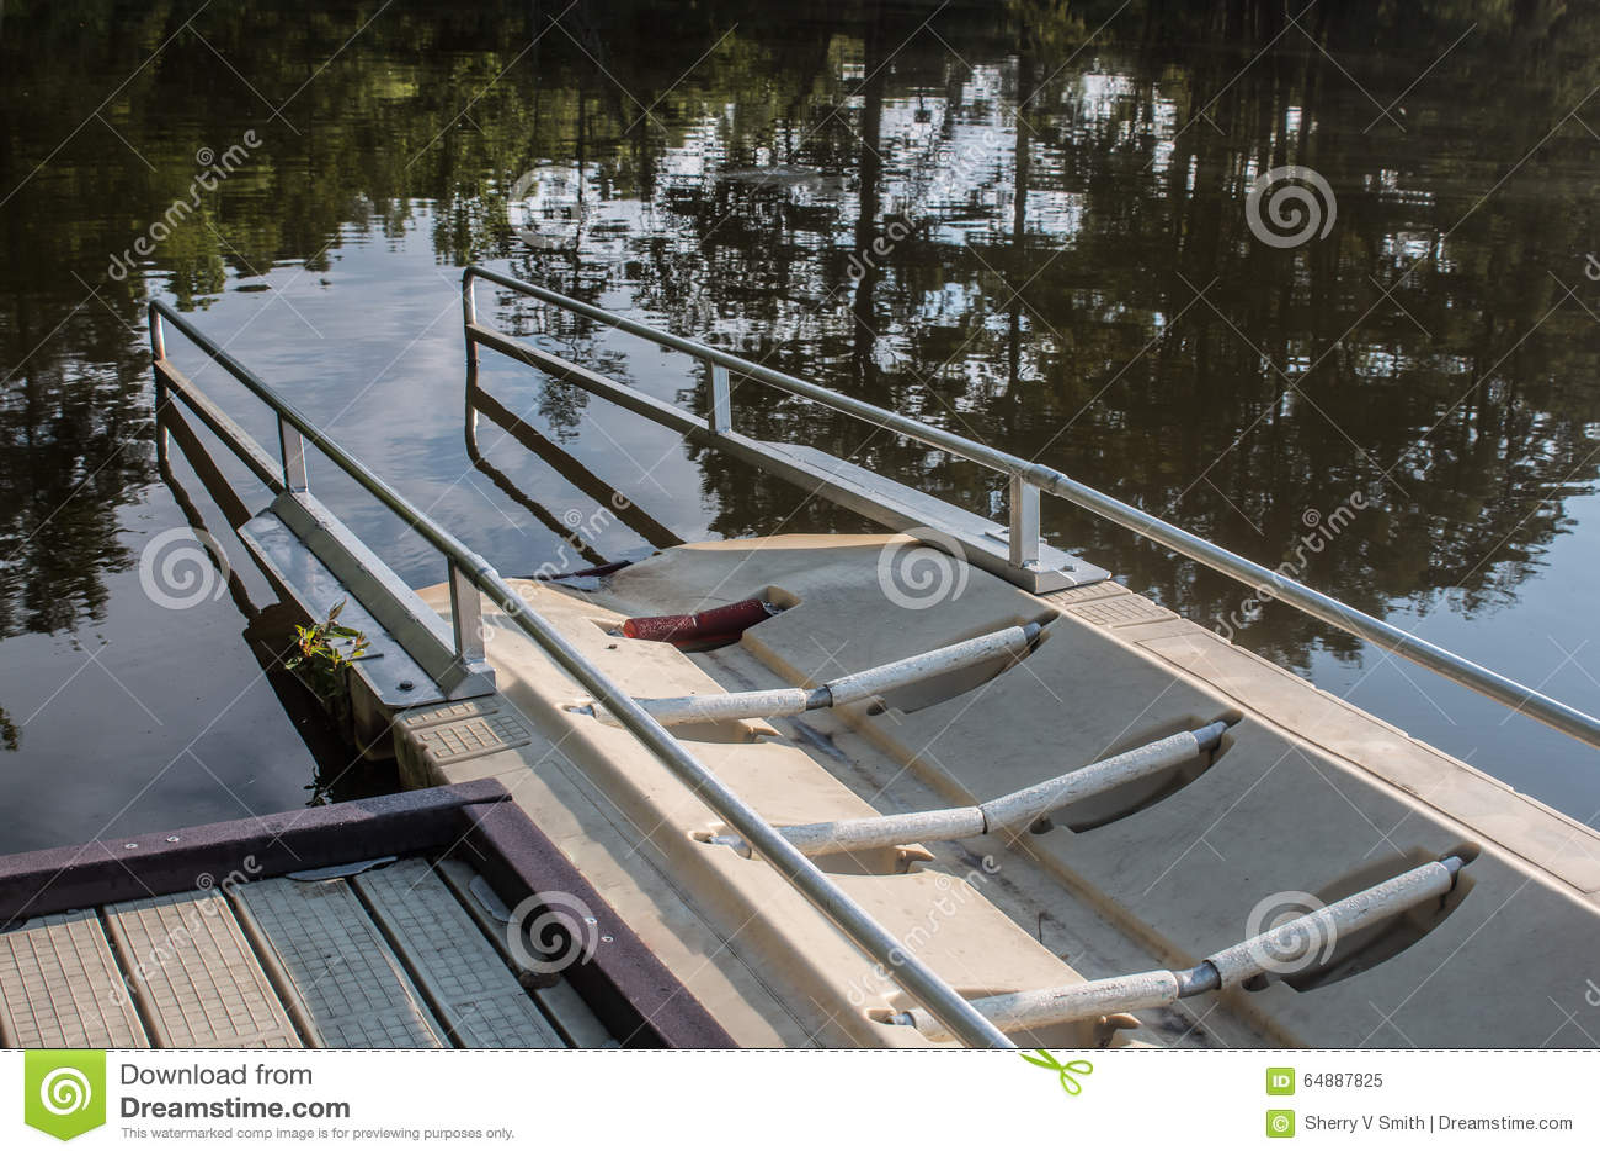 Close-Up Of Kayak Launch Ramp At Stumpy Lake Stock Photo - Image: 64887825